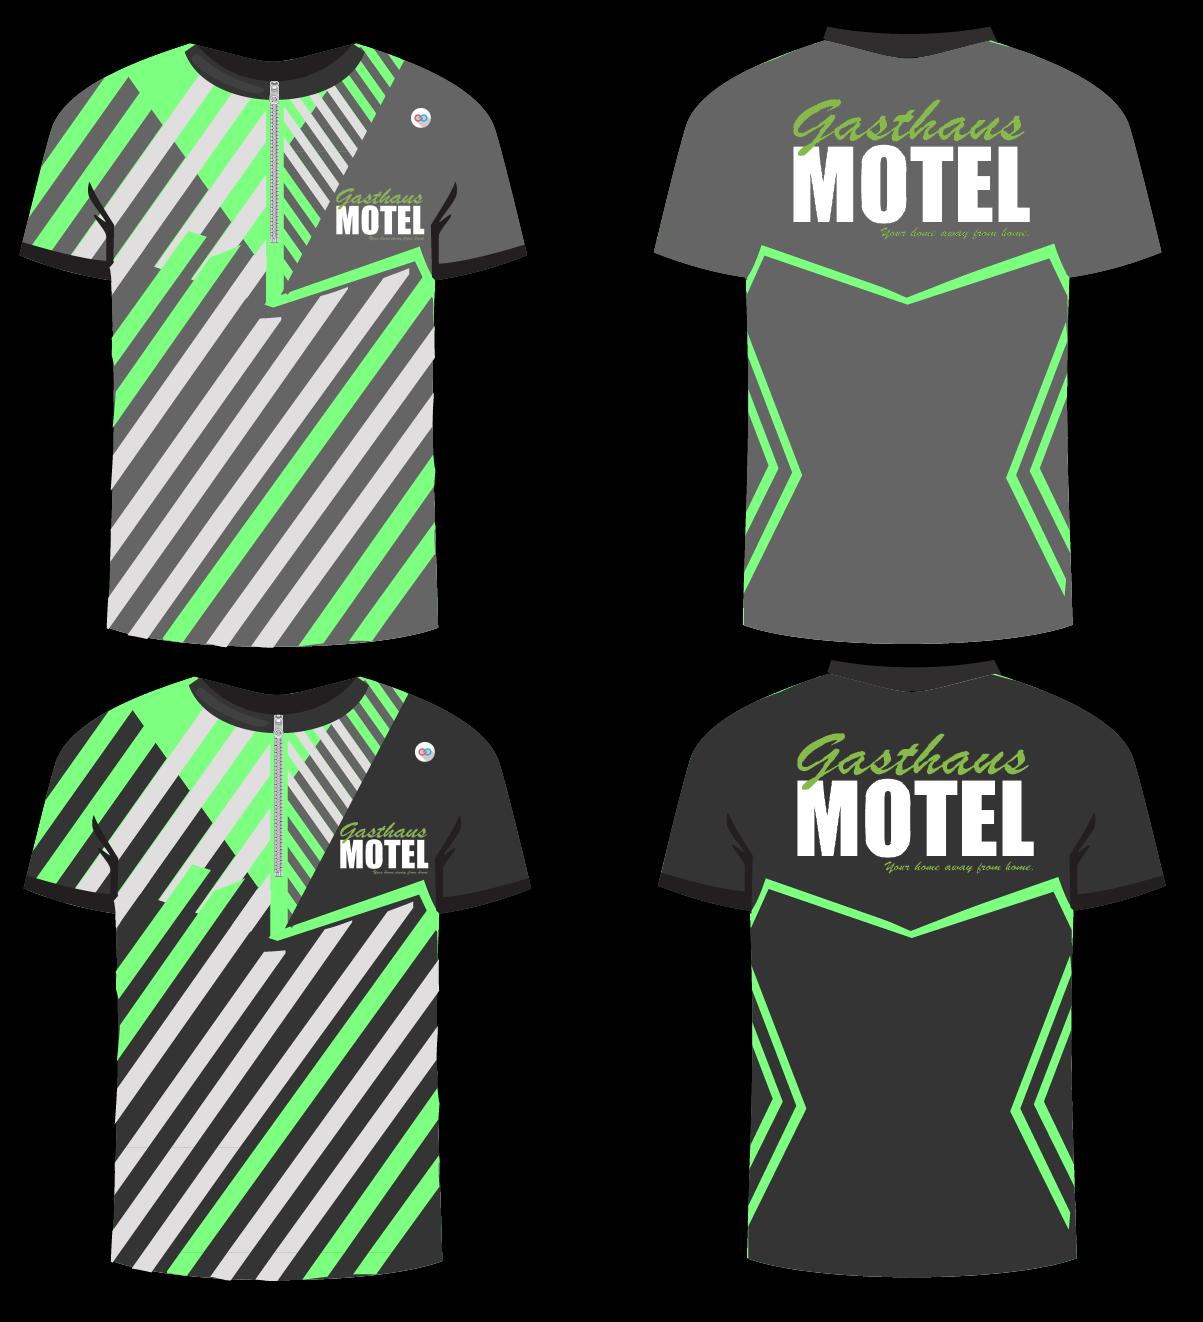 MOTEL Grey Green and White bowling uniforms, shirts, quarter zip polo